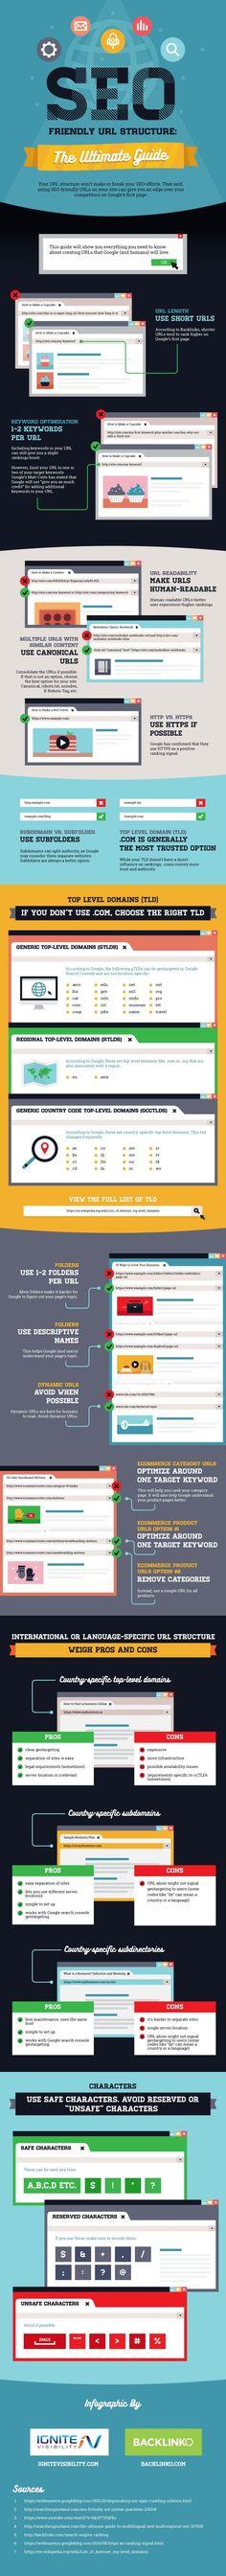 Optimisation SEO des URLs